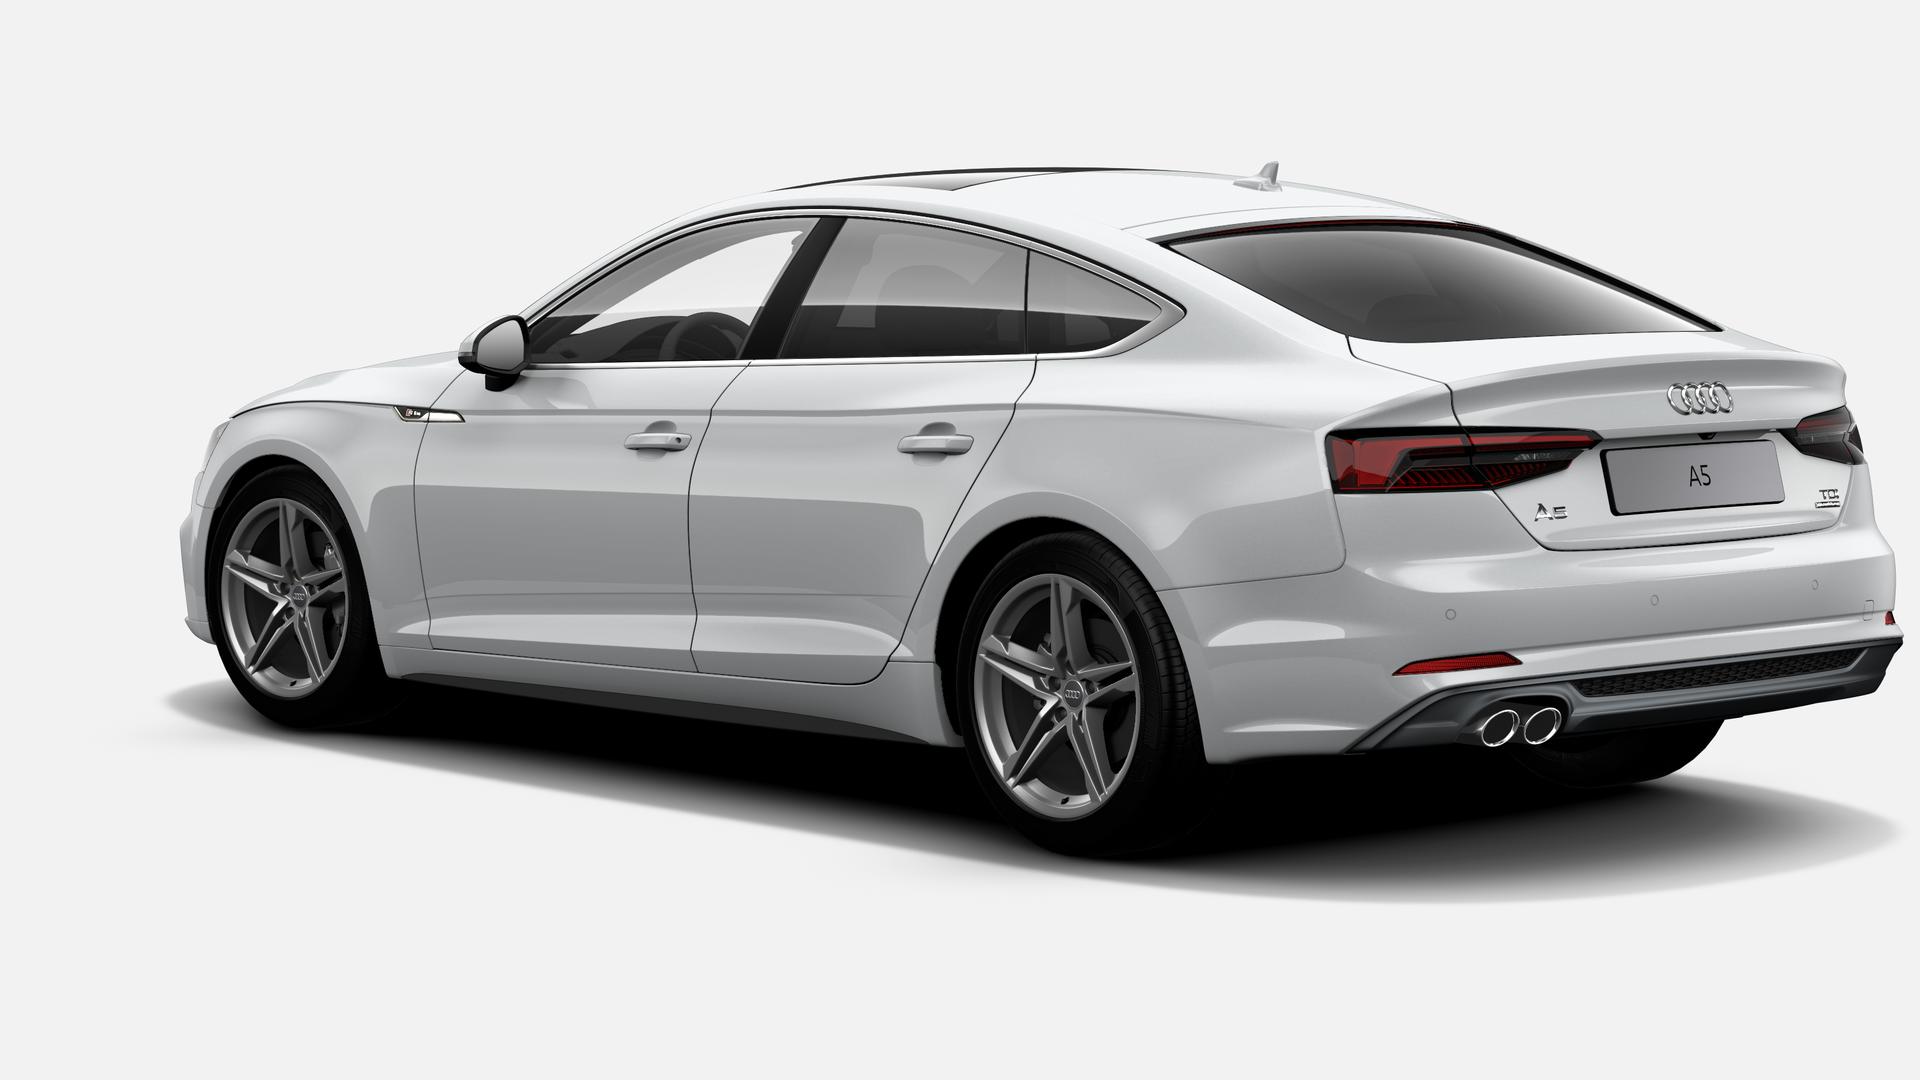 Vista Tres cuartos trasera izquierda de Audi A5 Sportback 2.0 TDI Sport quattro S tronic 140 kW (190 CV)